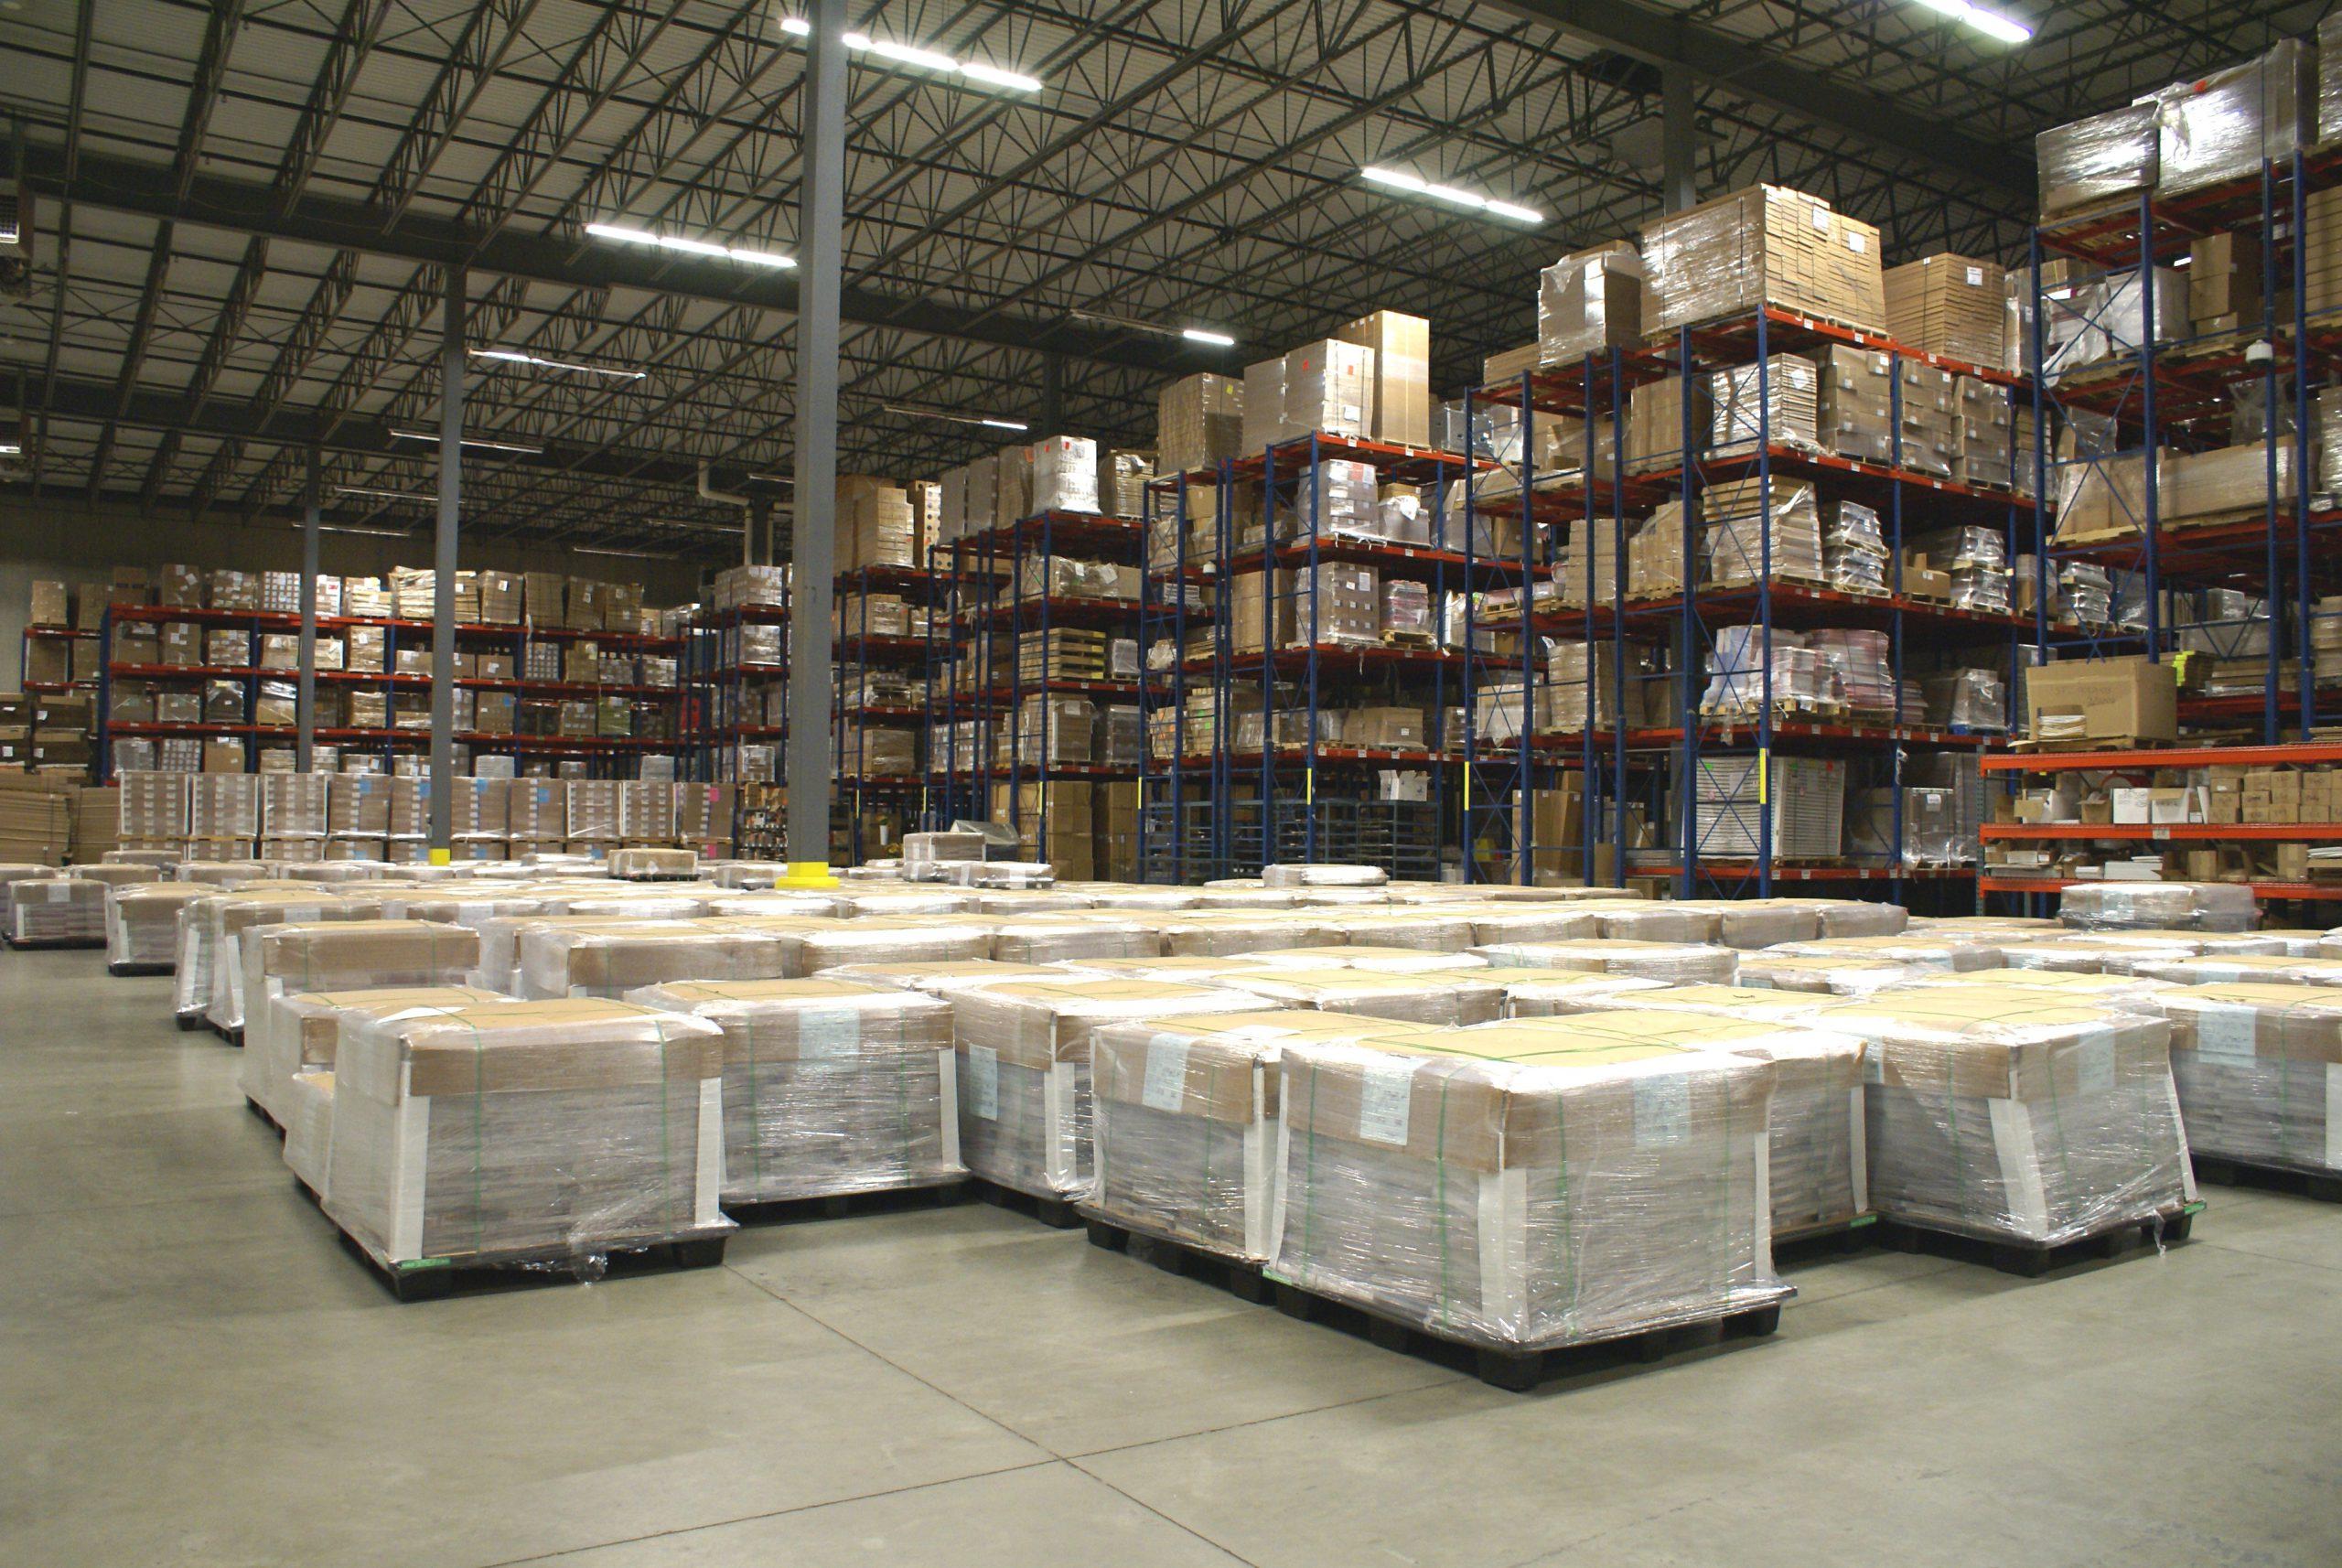 LI Group Warehouse Image - Logistics Page